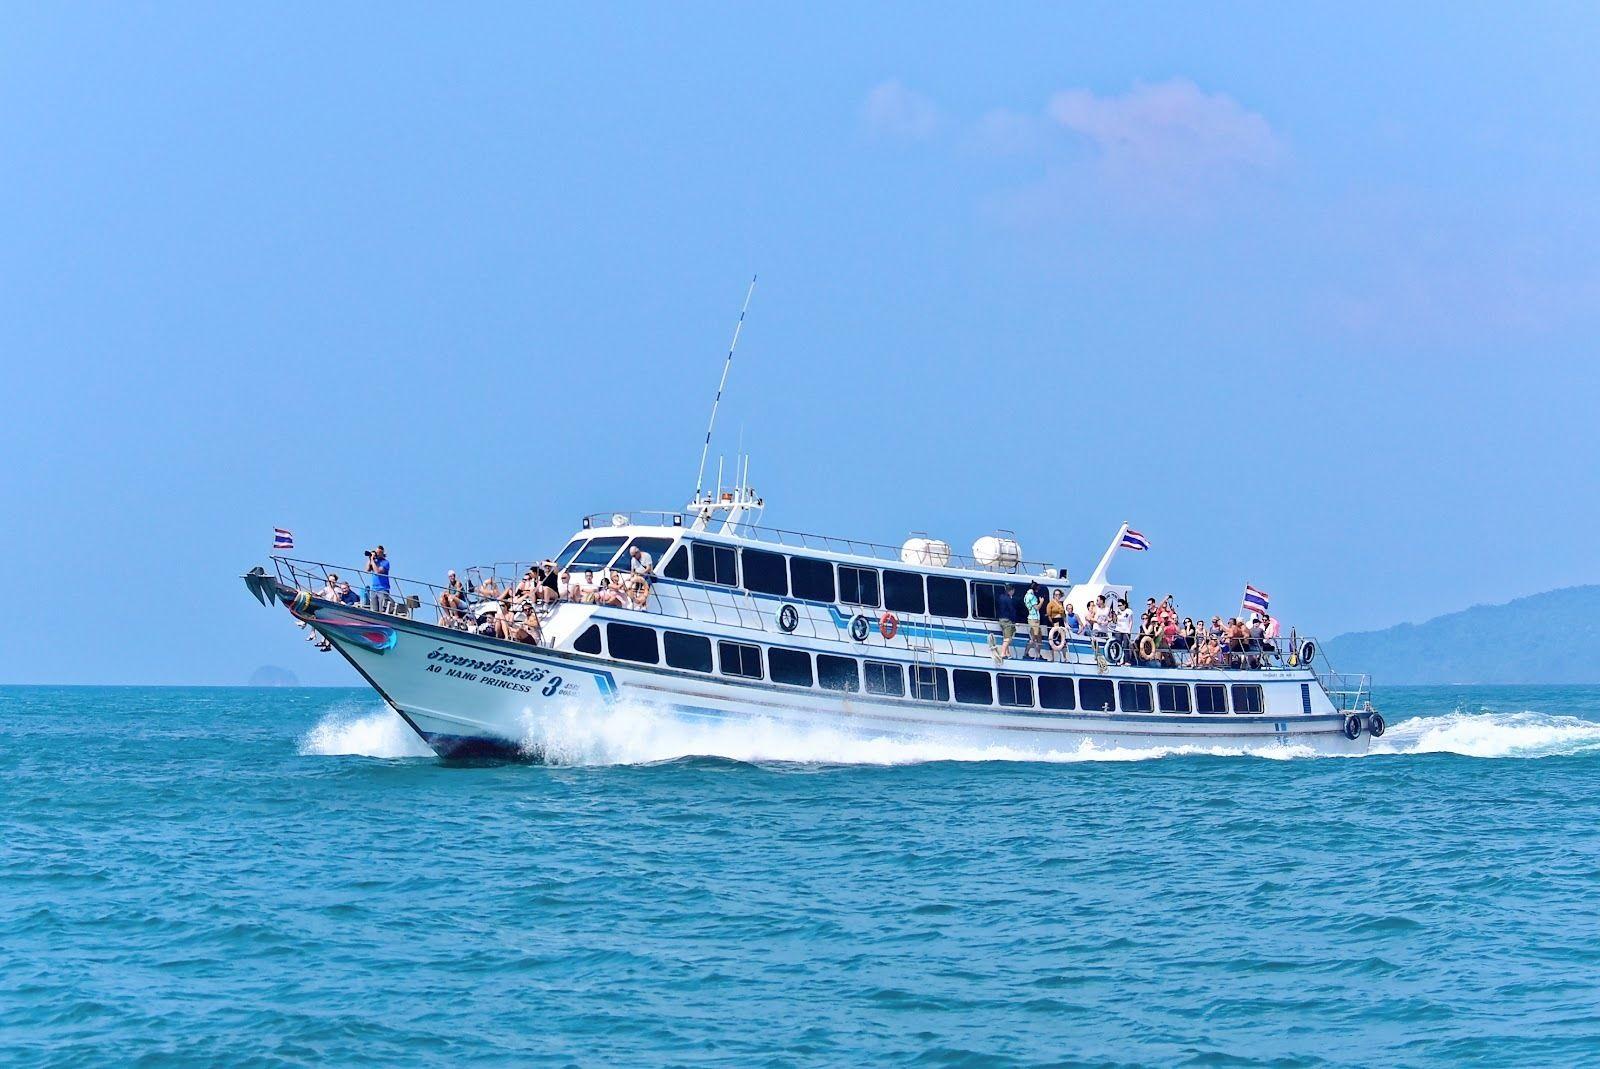 Koh Lanta to Railay Beach by Ao Nang Princess Ferry